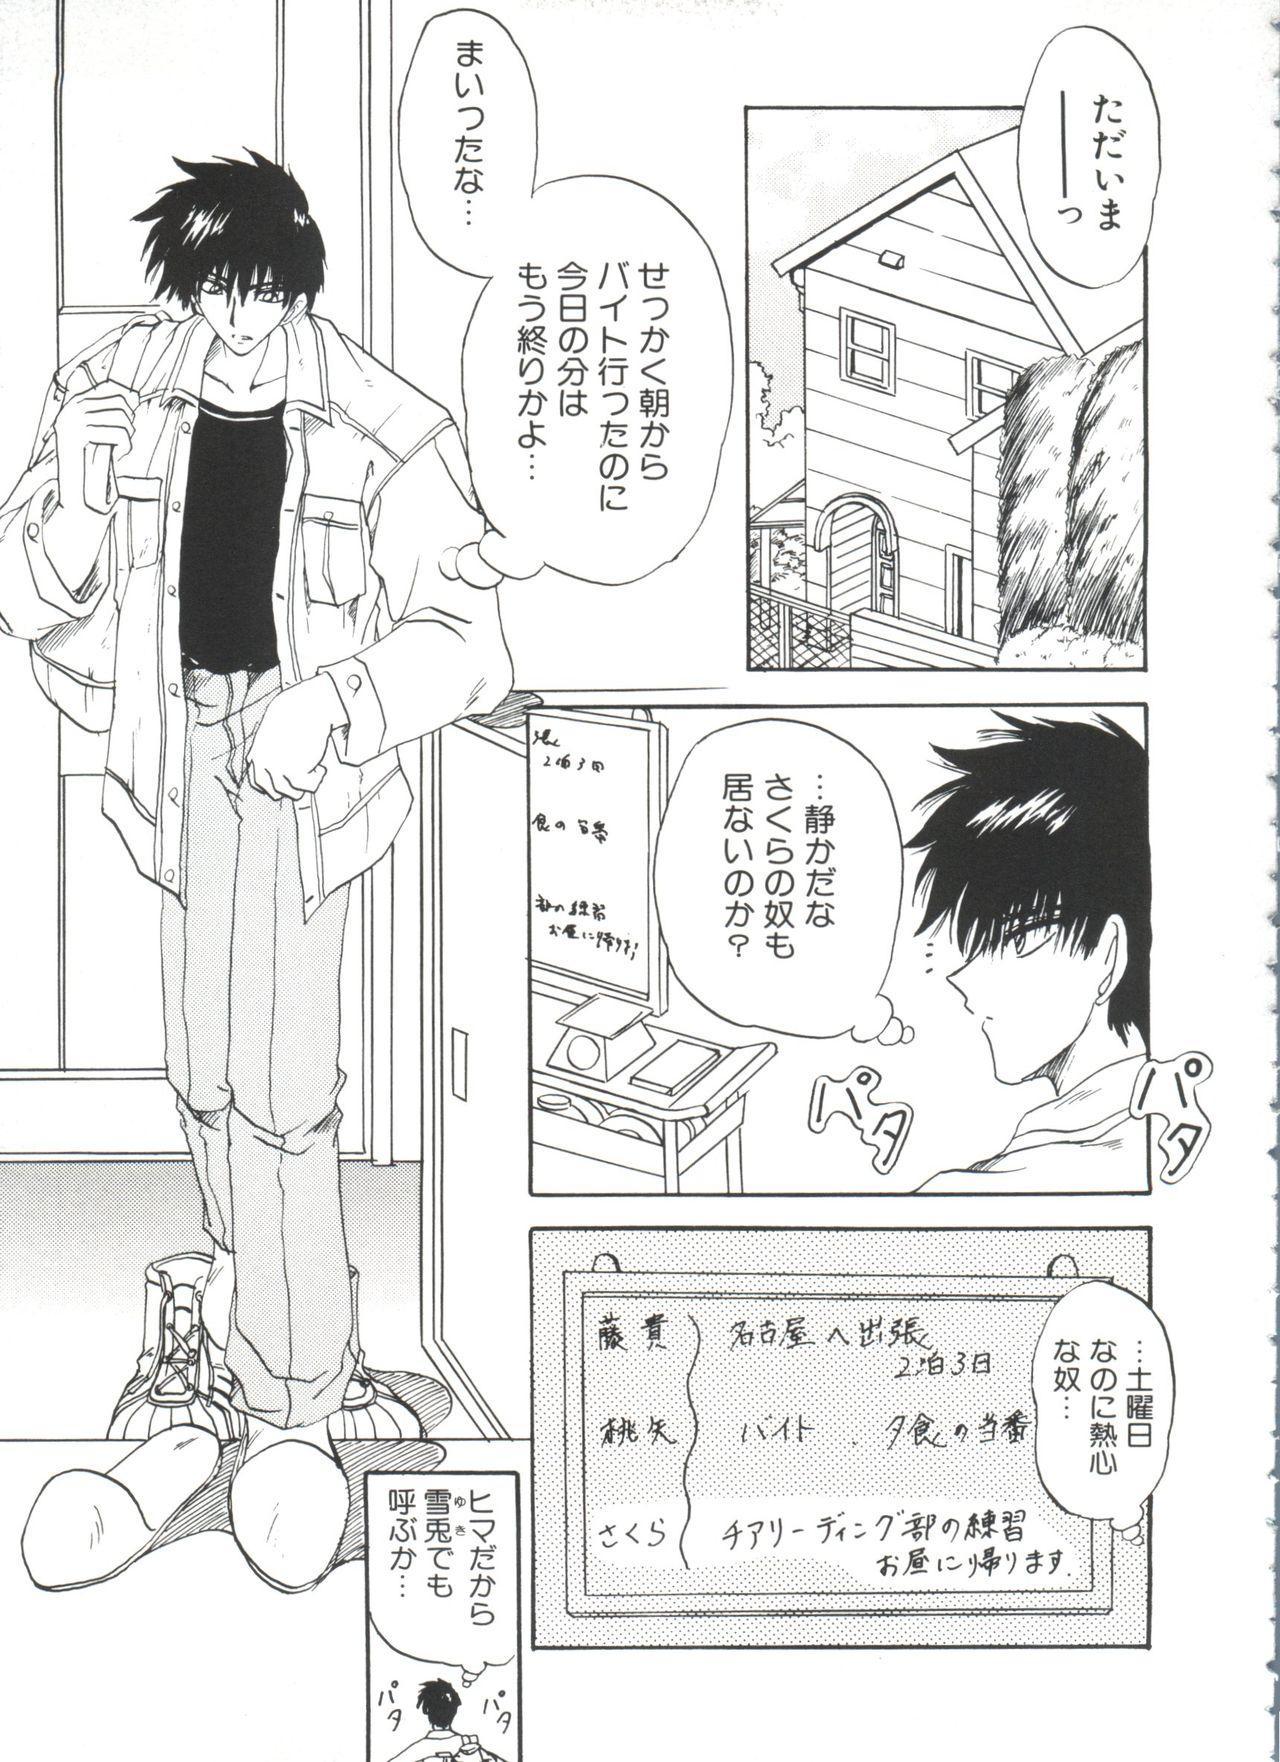 Ero-chan to Issho 2 96